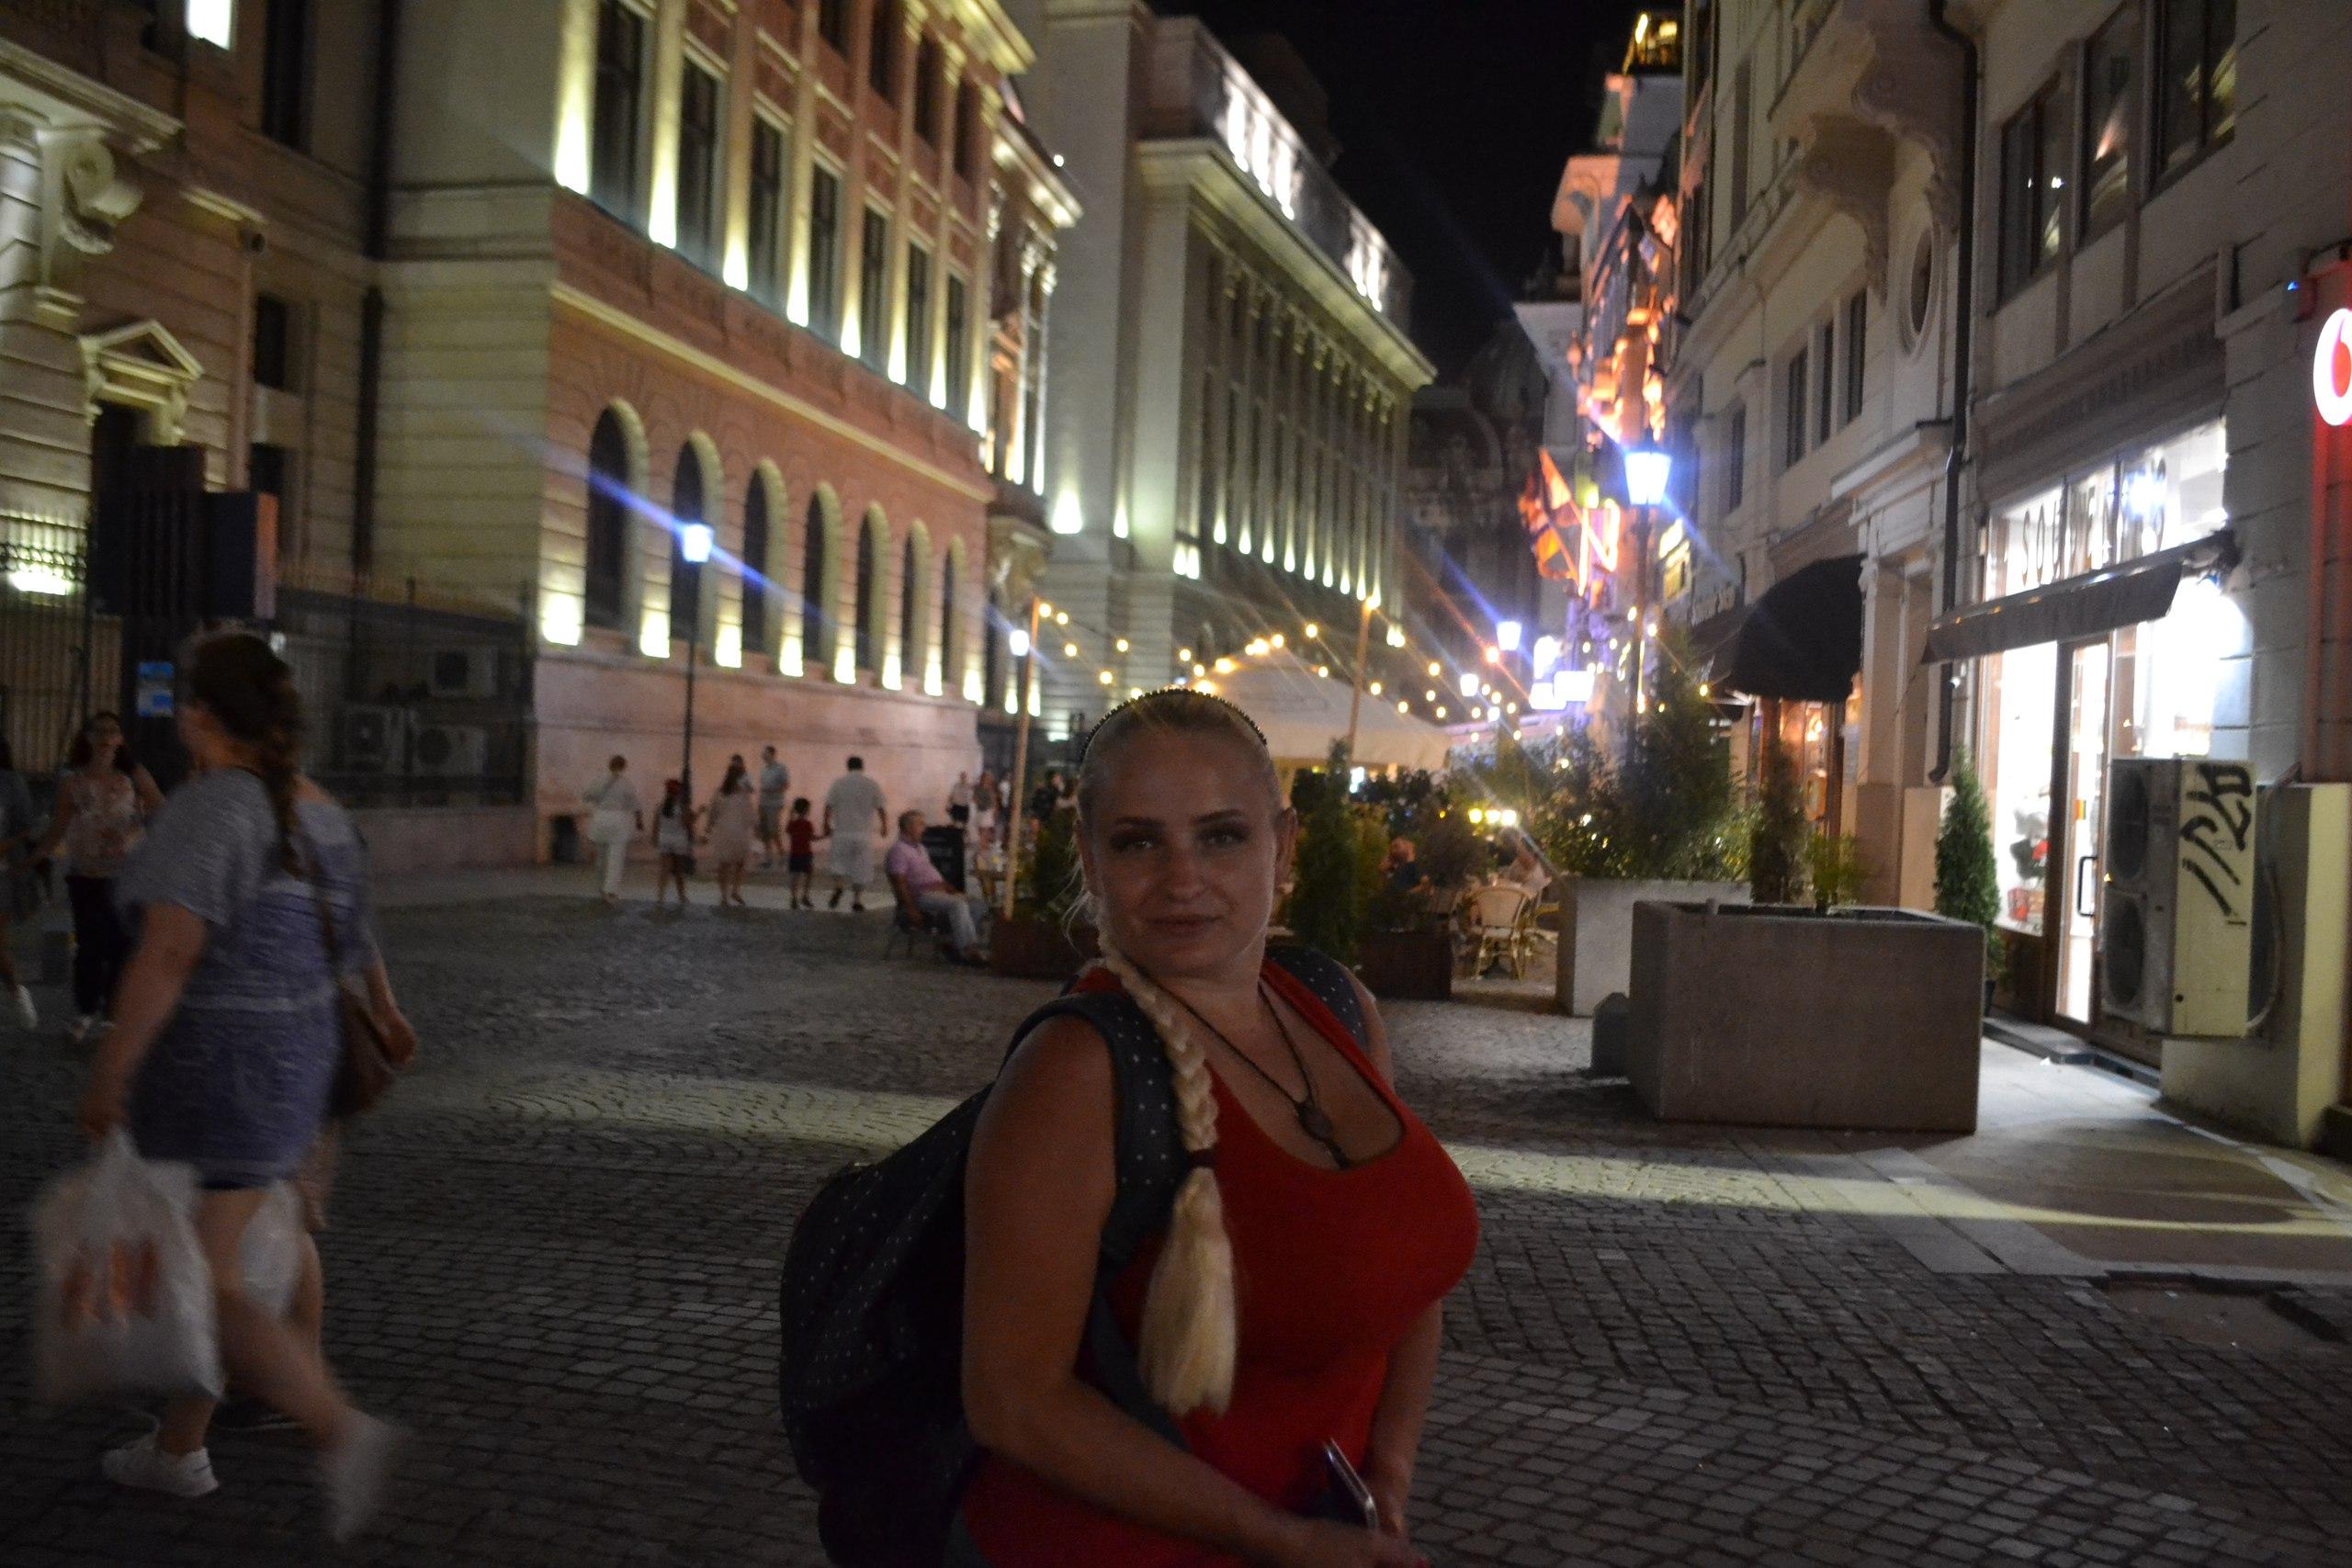 Елена Руденко (Валтея). Румыния. Август 2017 г. Трансильвания. Замок Бран (Замок Дракулы), Замок Пелеш, Бухарест. N0Kxjj4QQnI